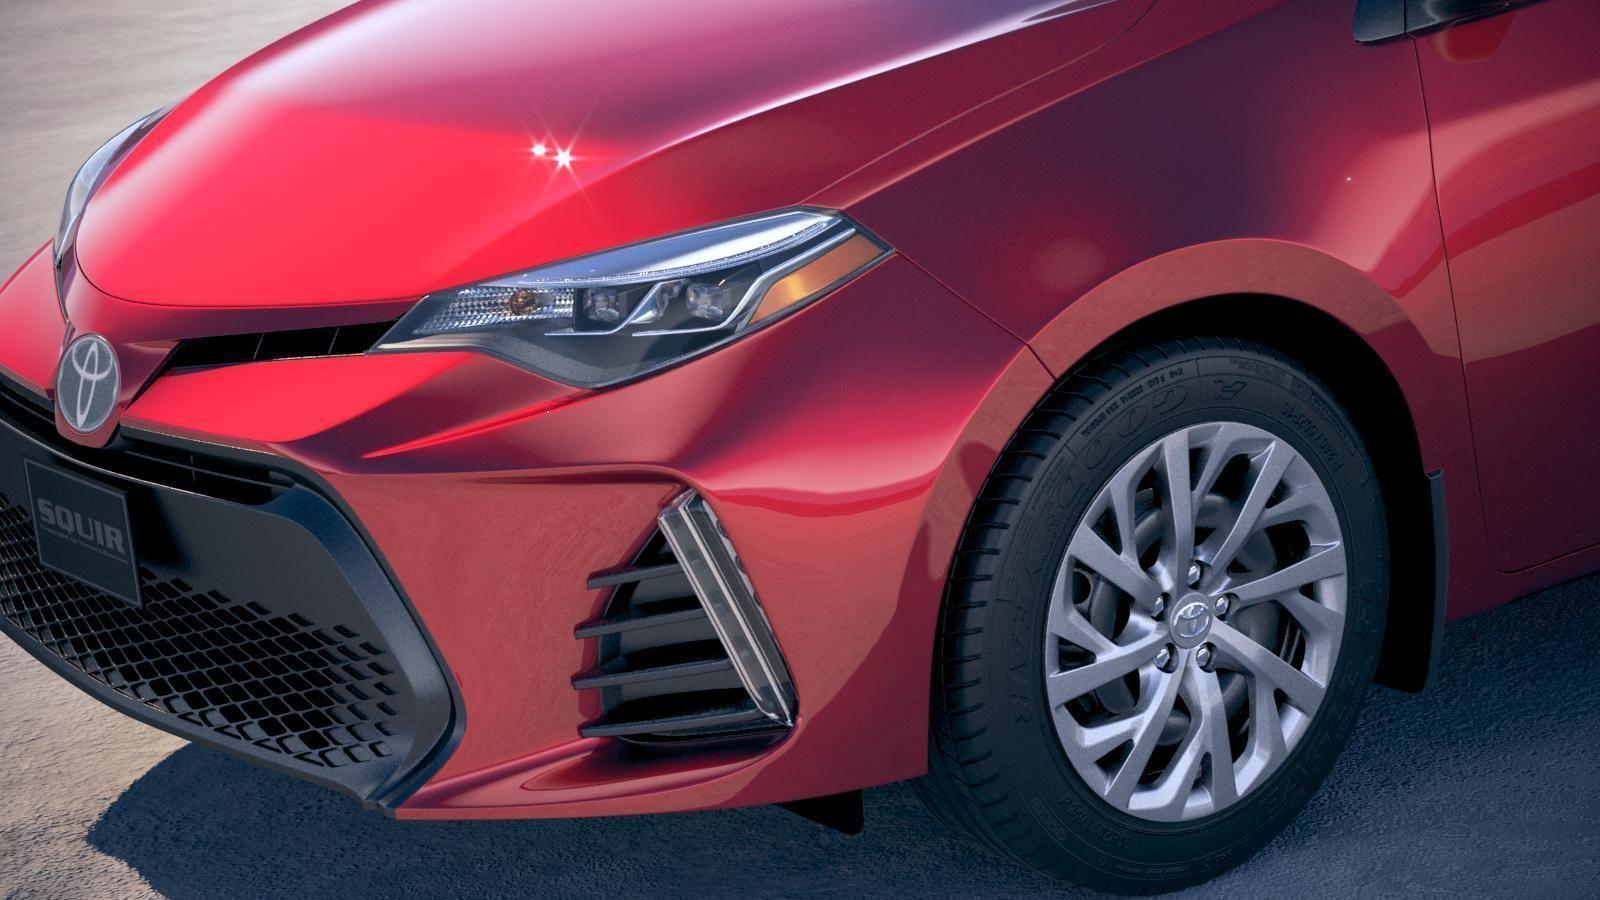 Toyota Corolla Usa 2017 Model Max Obj Mtl S Fbx C4d Lwo Lw Lws 3